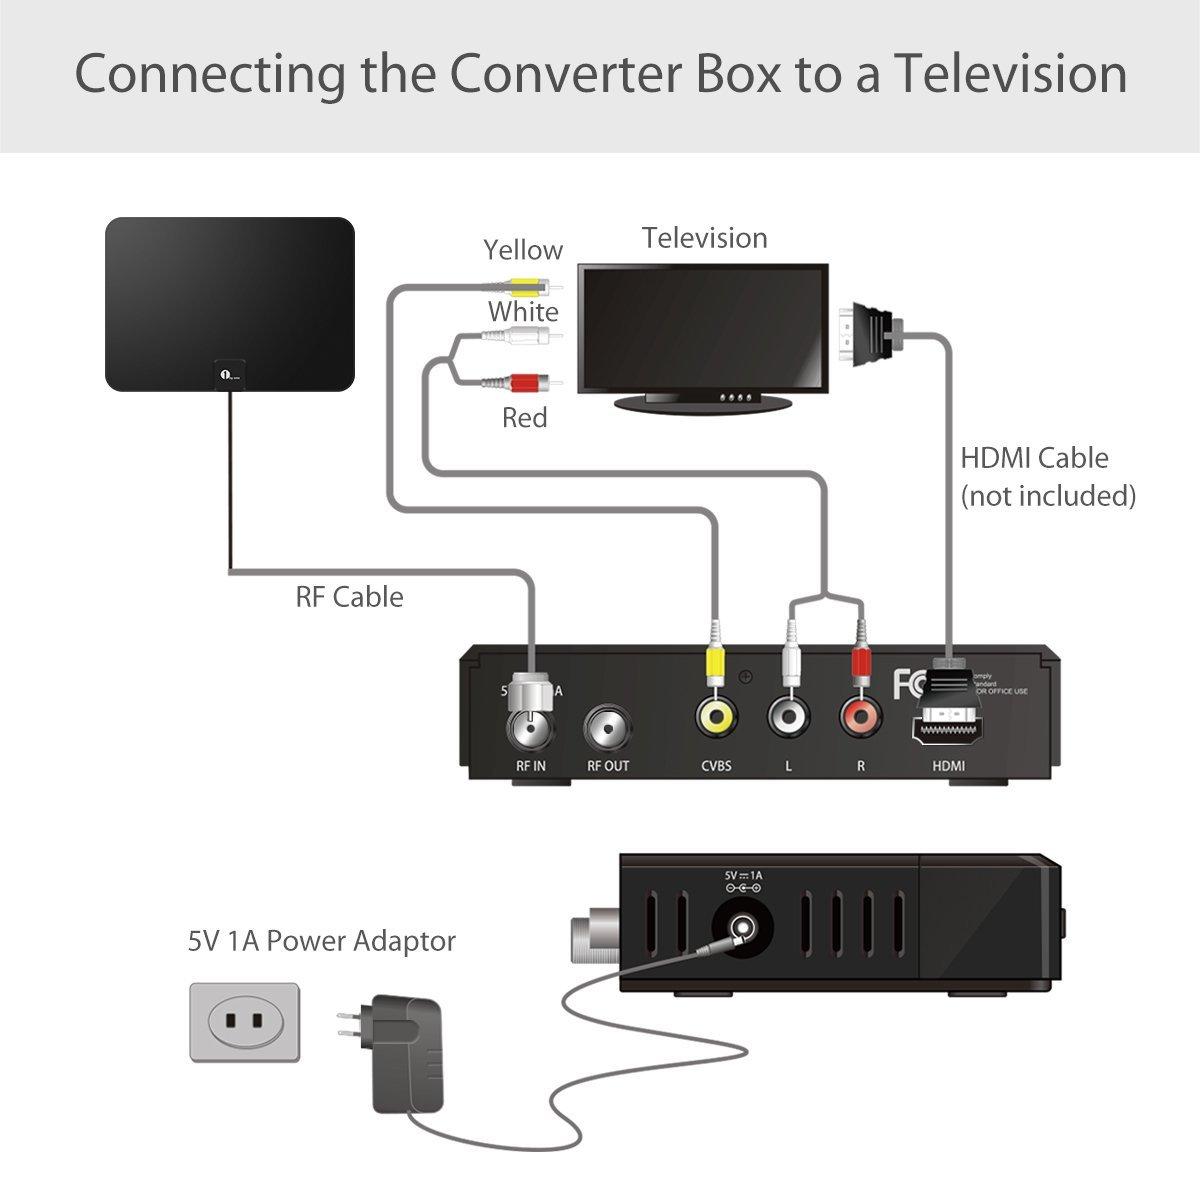 1byone ATSC Converter Box Setup